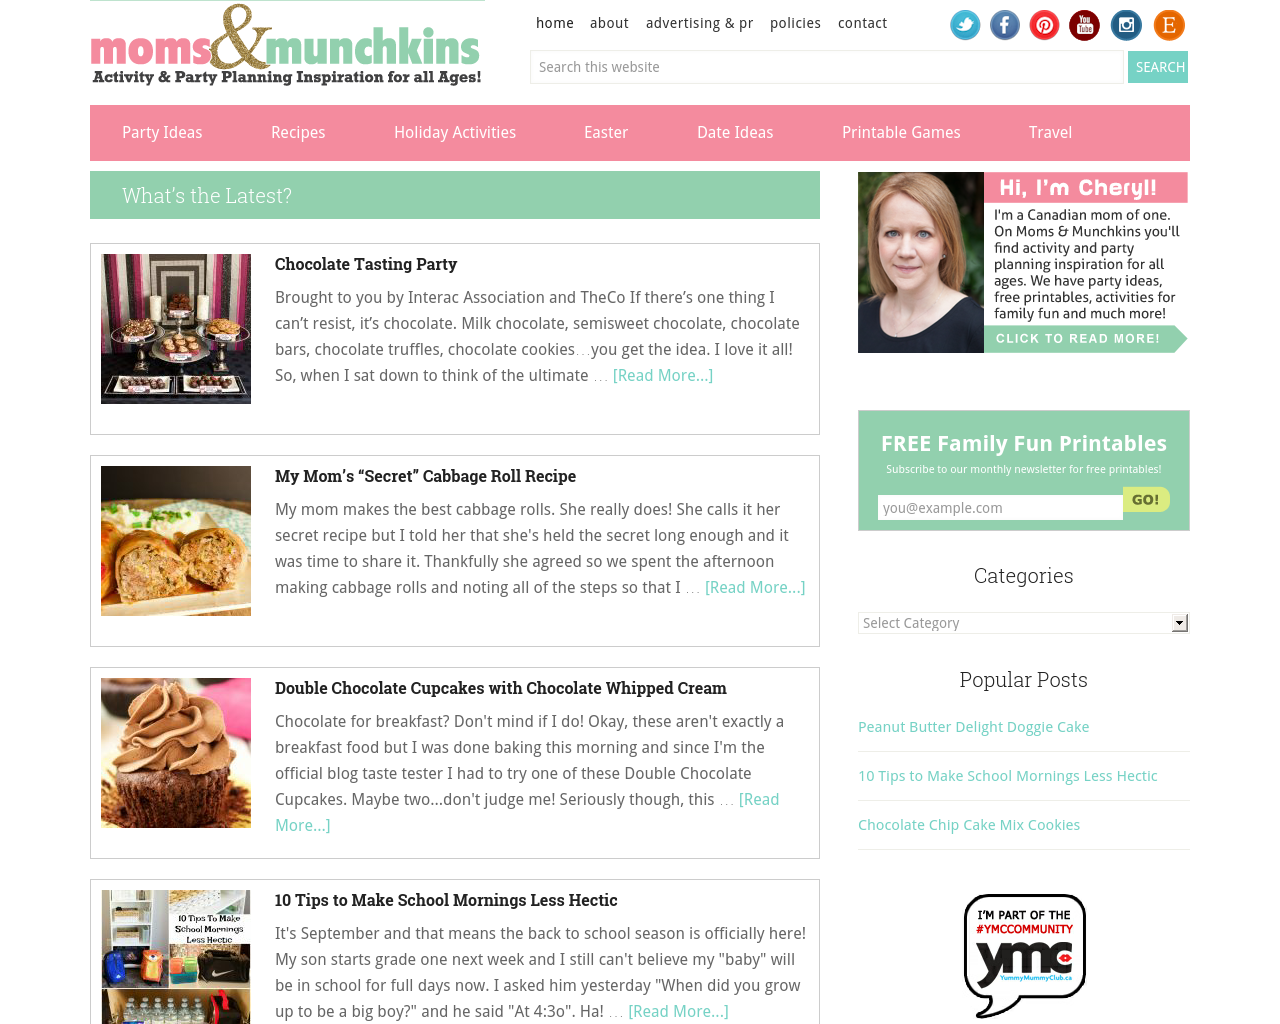 Moms-&-Munchkins-Advertising-Reviews-Pricing